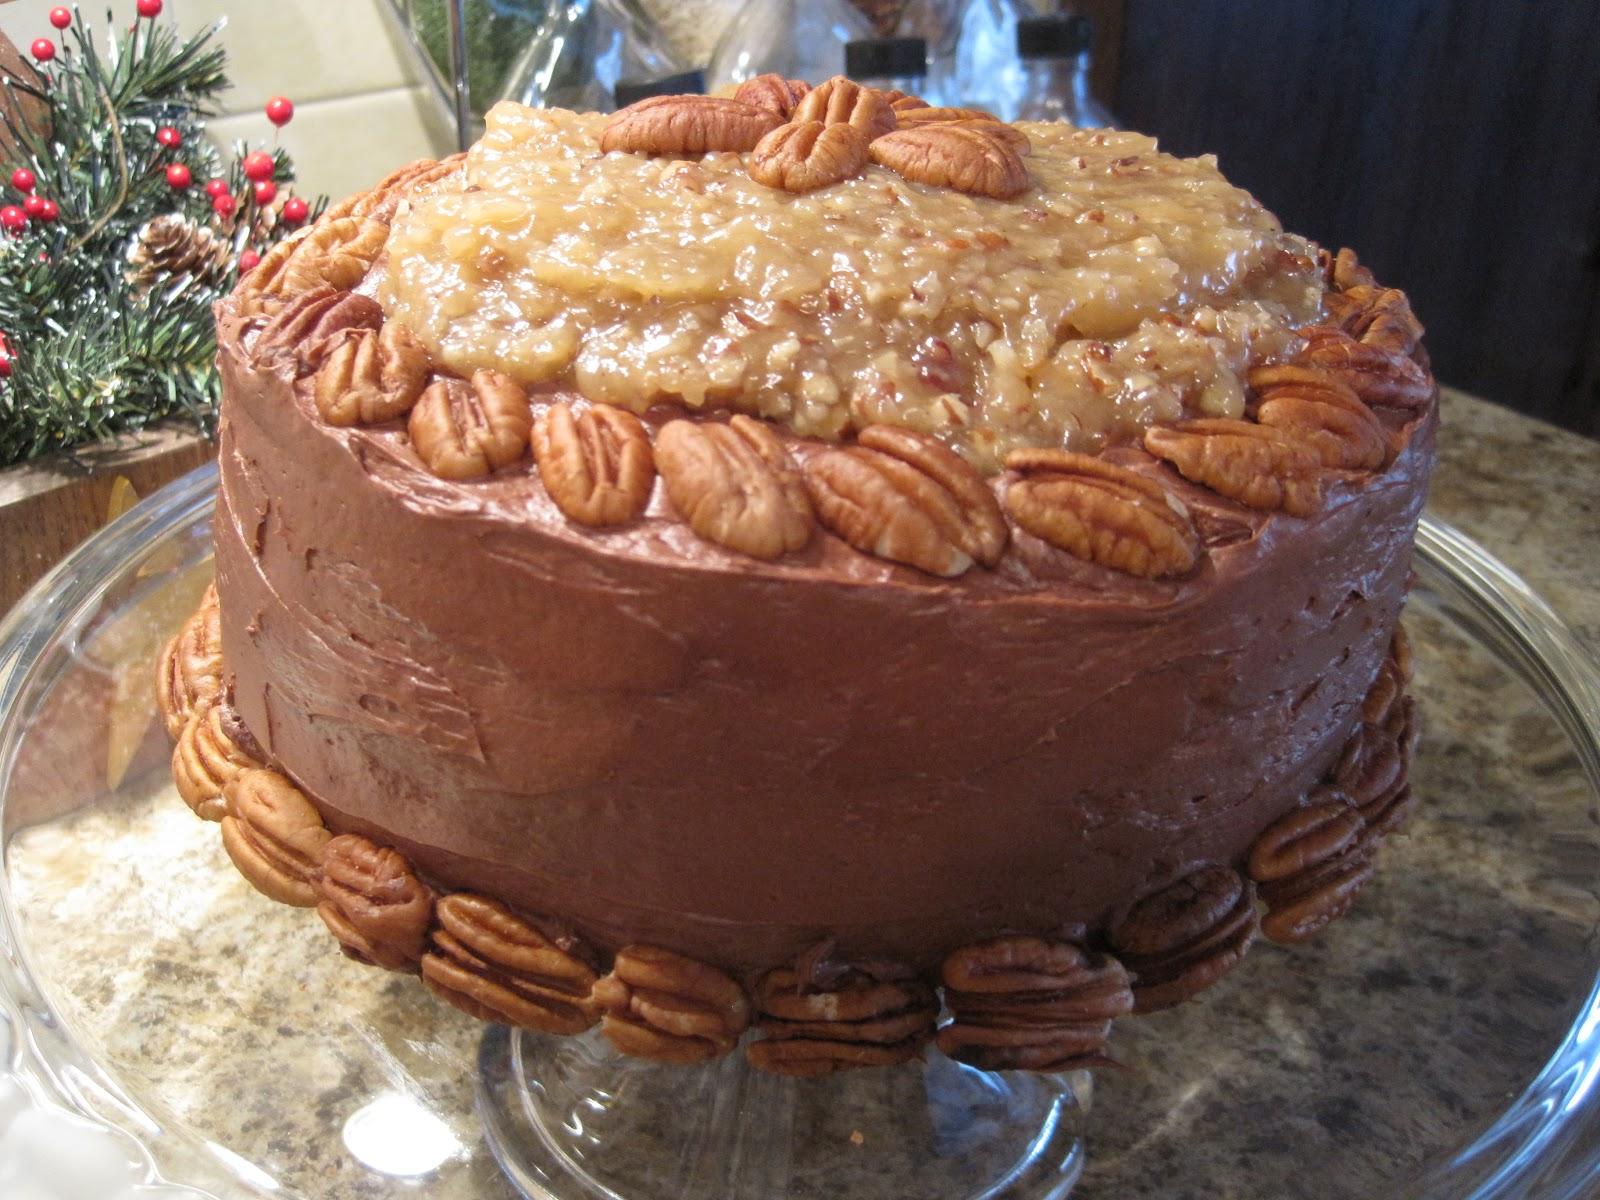 Paula Deen Chocolate Cake Peanut Butter Frosting